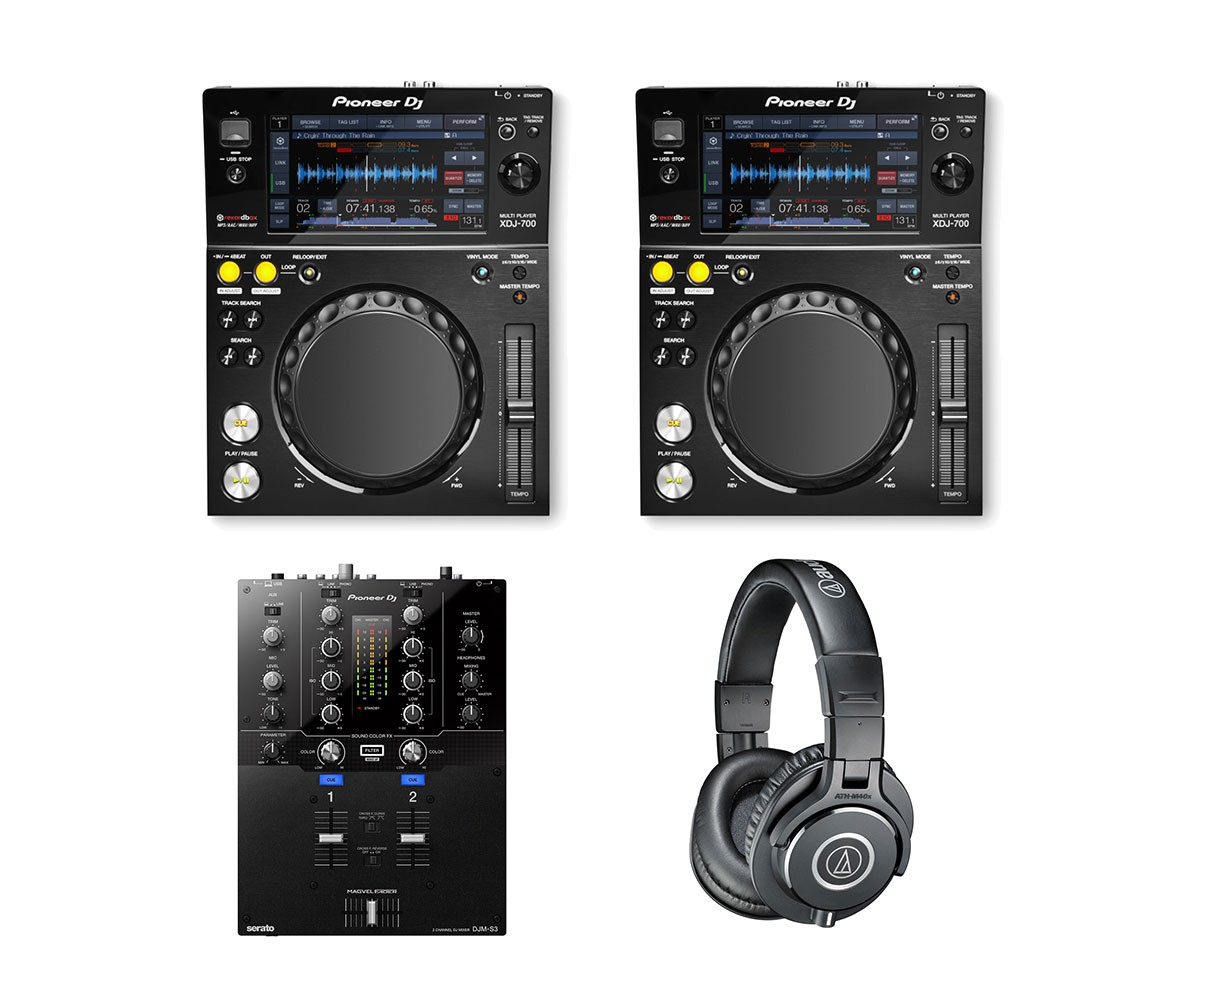 2x Pioneer XDJ-700 + DJM-S3 + ATH-M40X